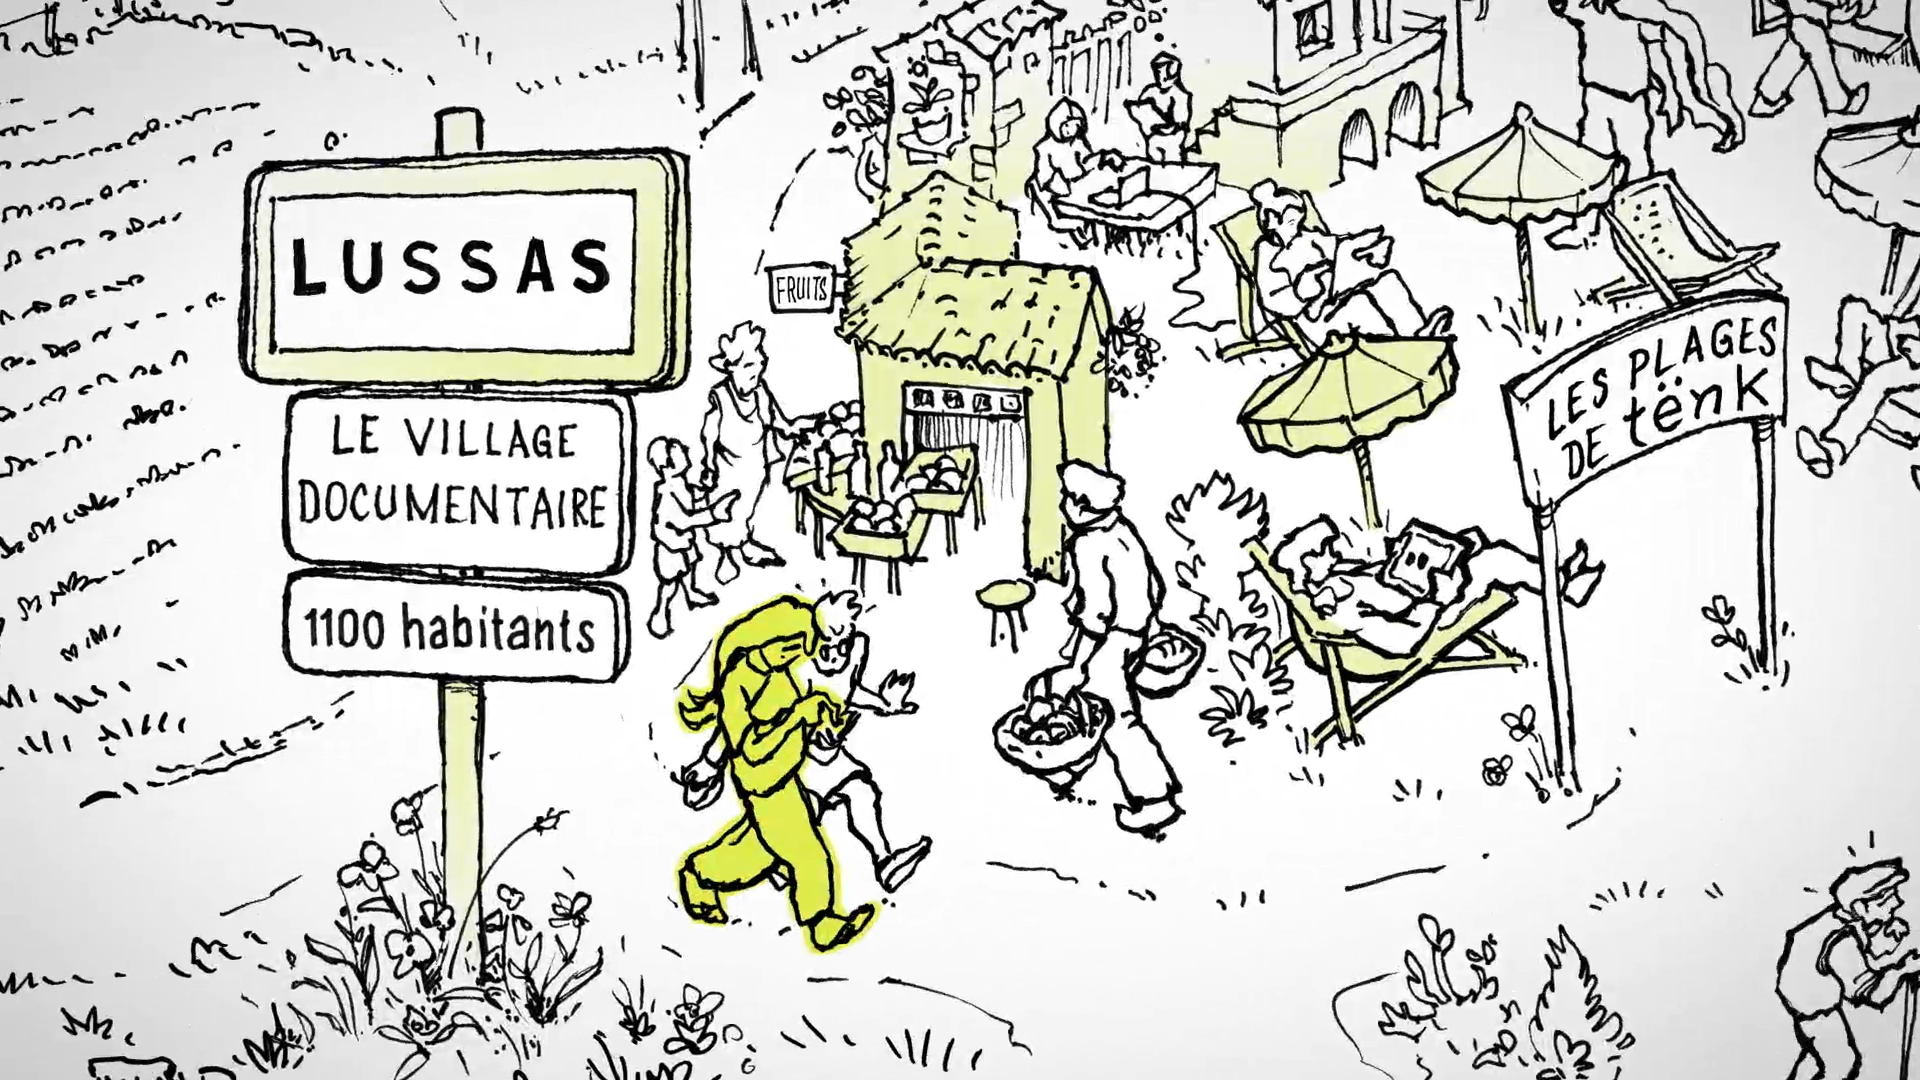 village claire simon zinebi institut français bilbao